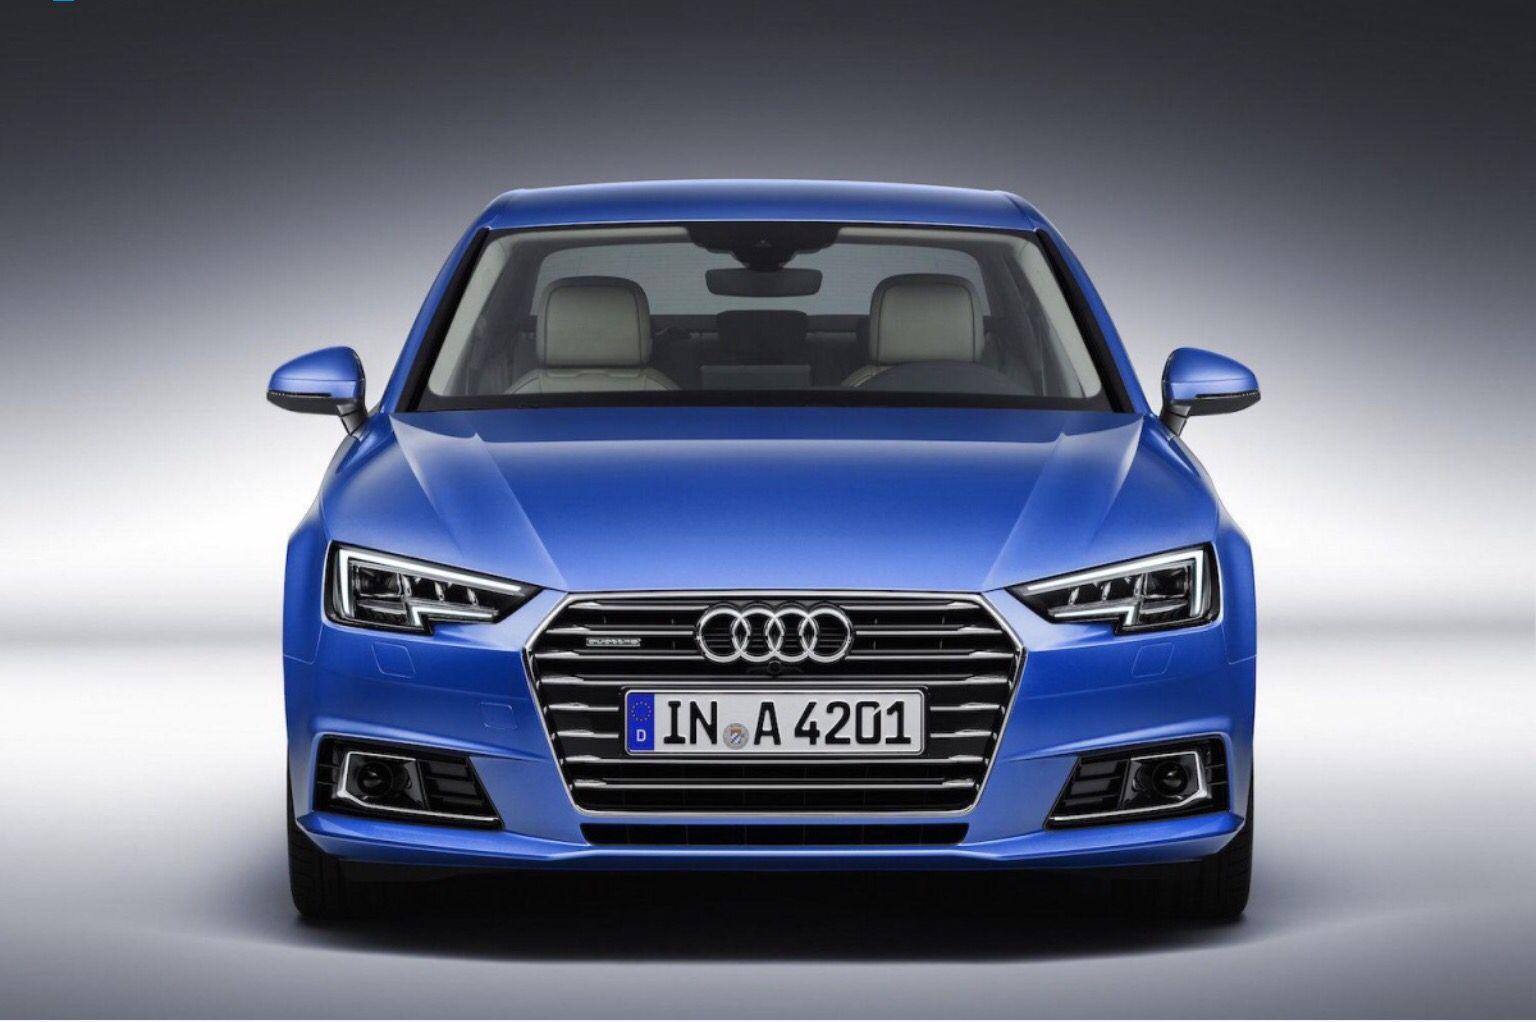 2017 Audi A4 Audi a4, Audi, Bmw new cars